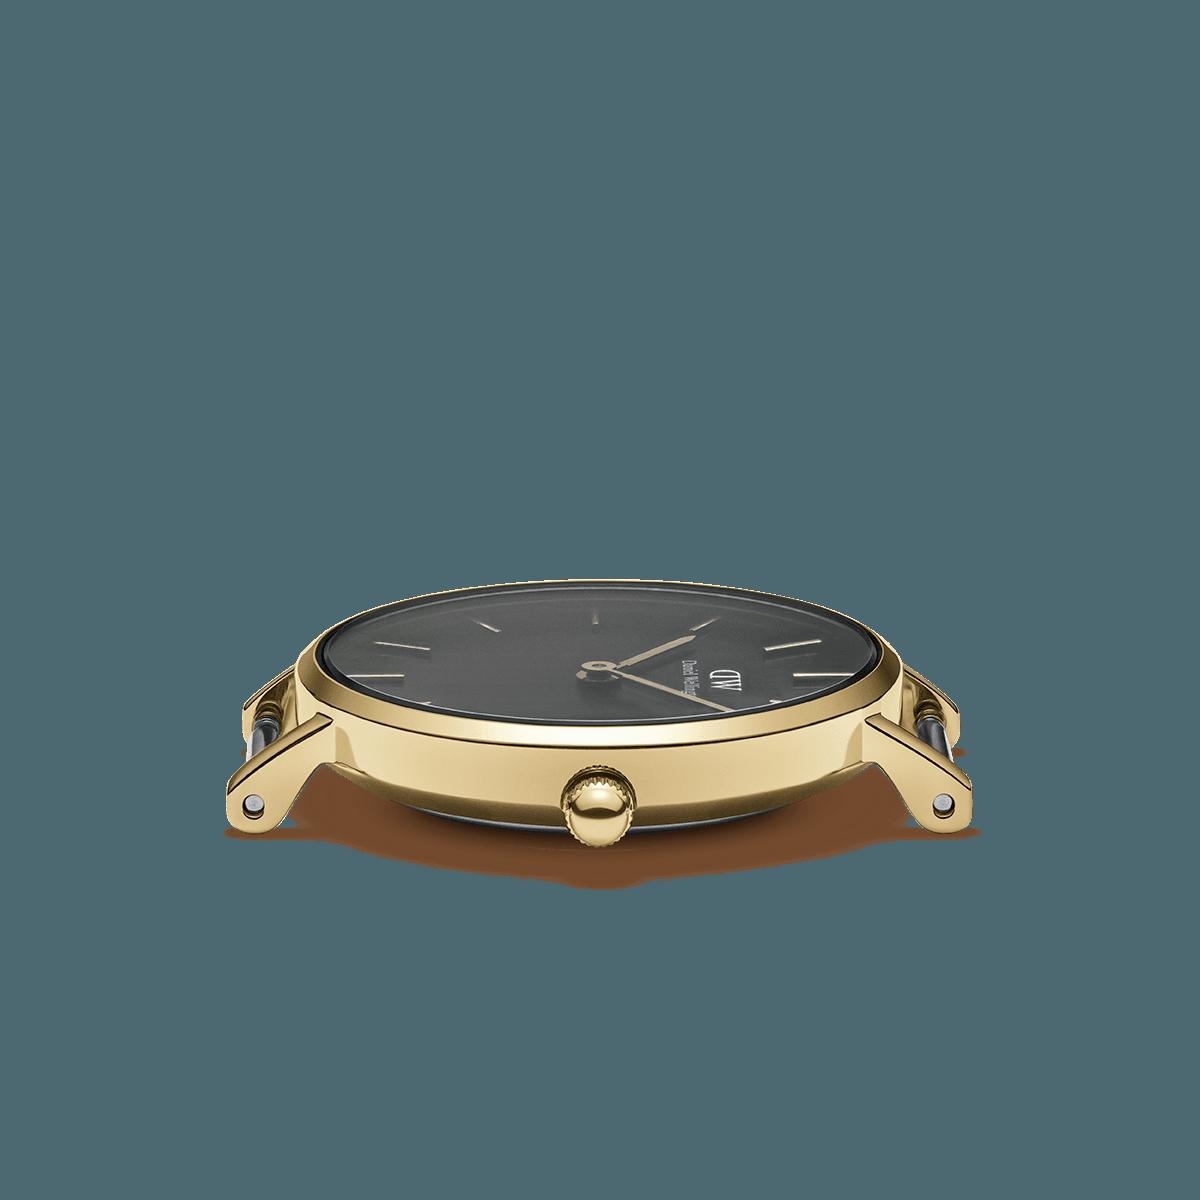 dw官网 dw手表官网 dw中国官网 dw官方旗舰店 DW DW官网  Watch Petite Black Evergold Gold 32mm